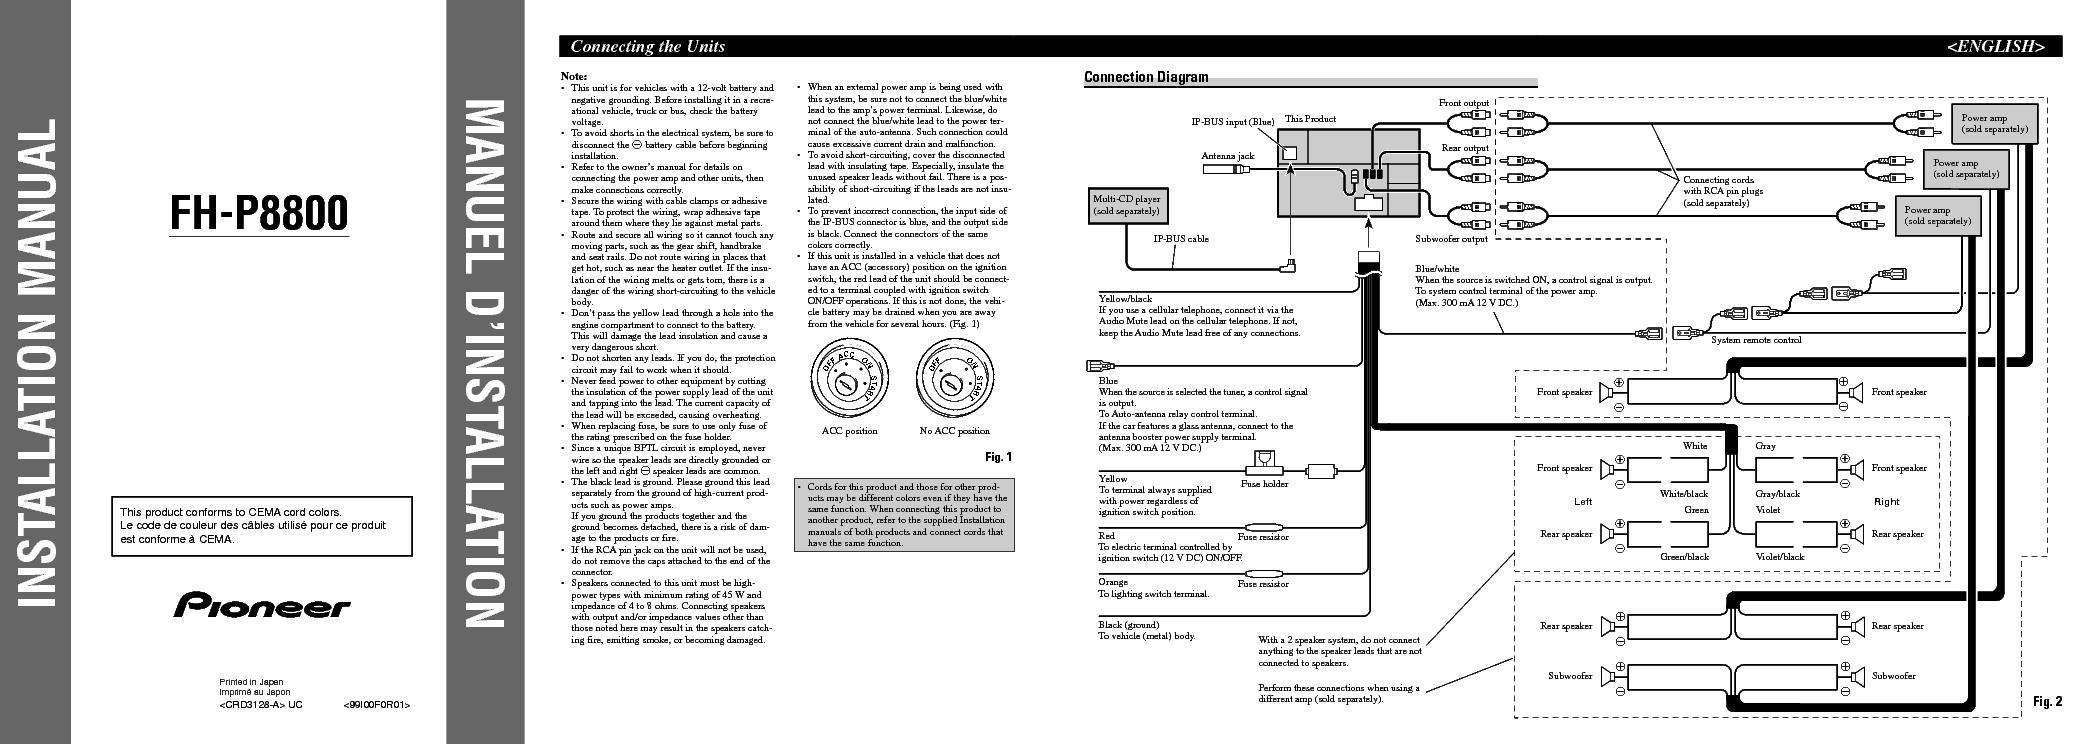 DIAGRAM] Pioneer Deh X65bt Wiring Diagram FULL Version HD Quality Wiring  Diagram - 135165.ACCNET.FRaccnet.fr